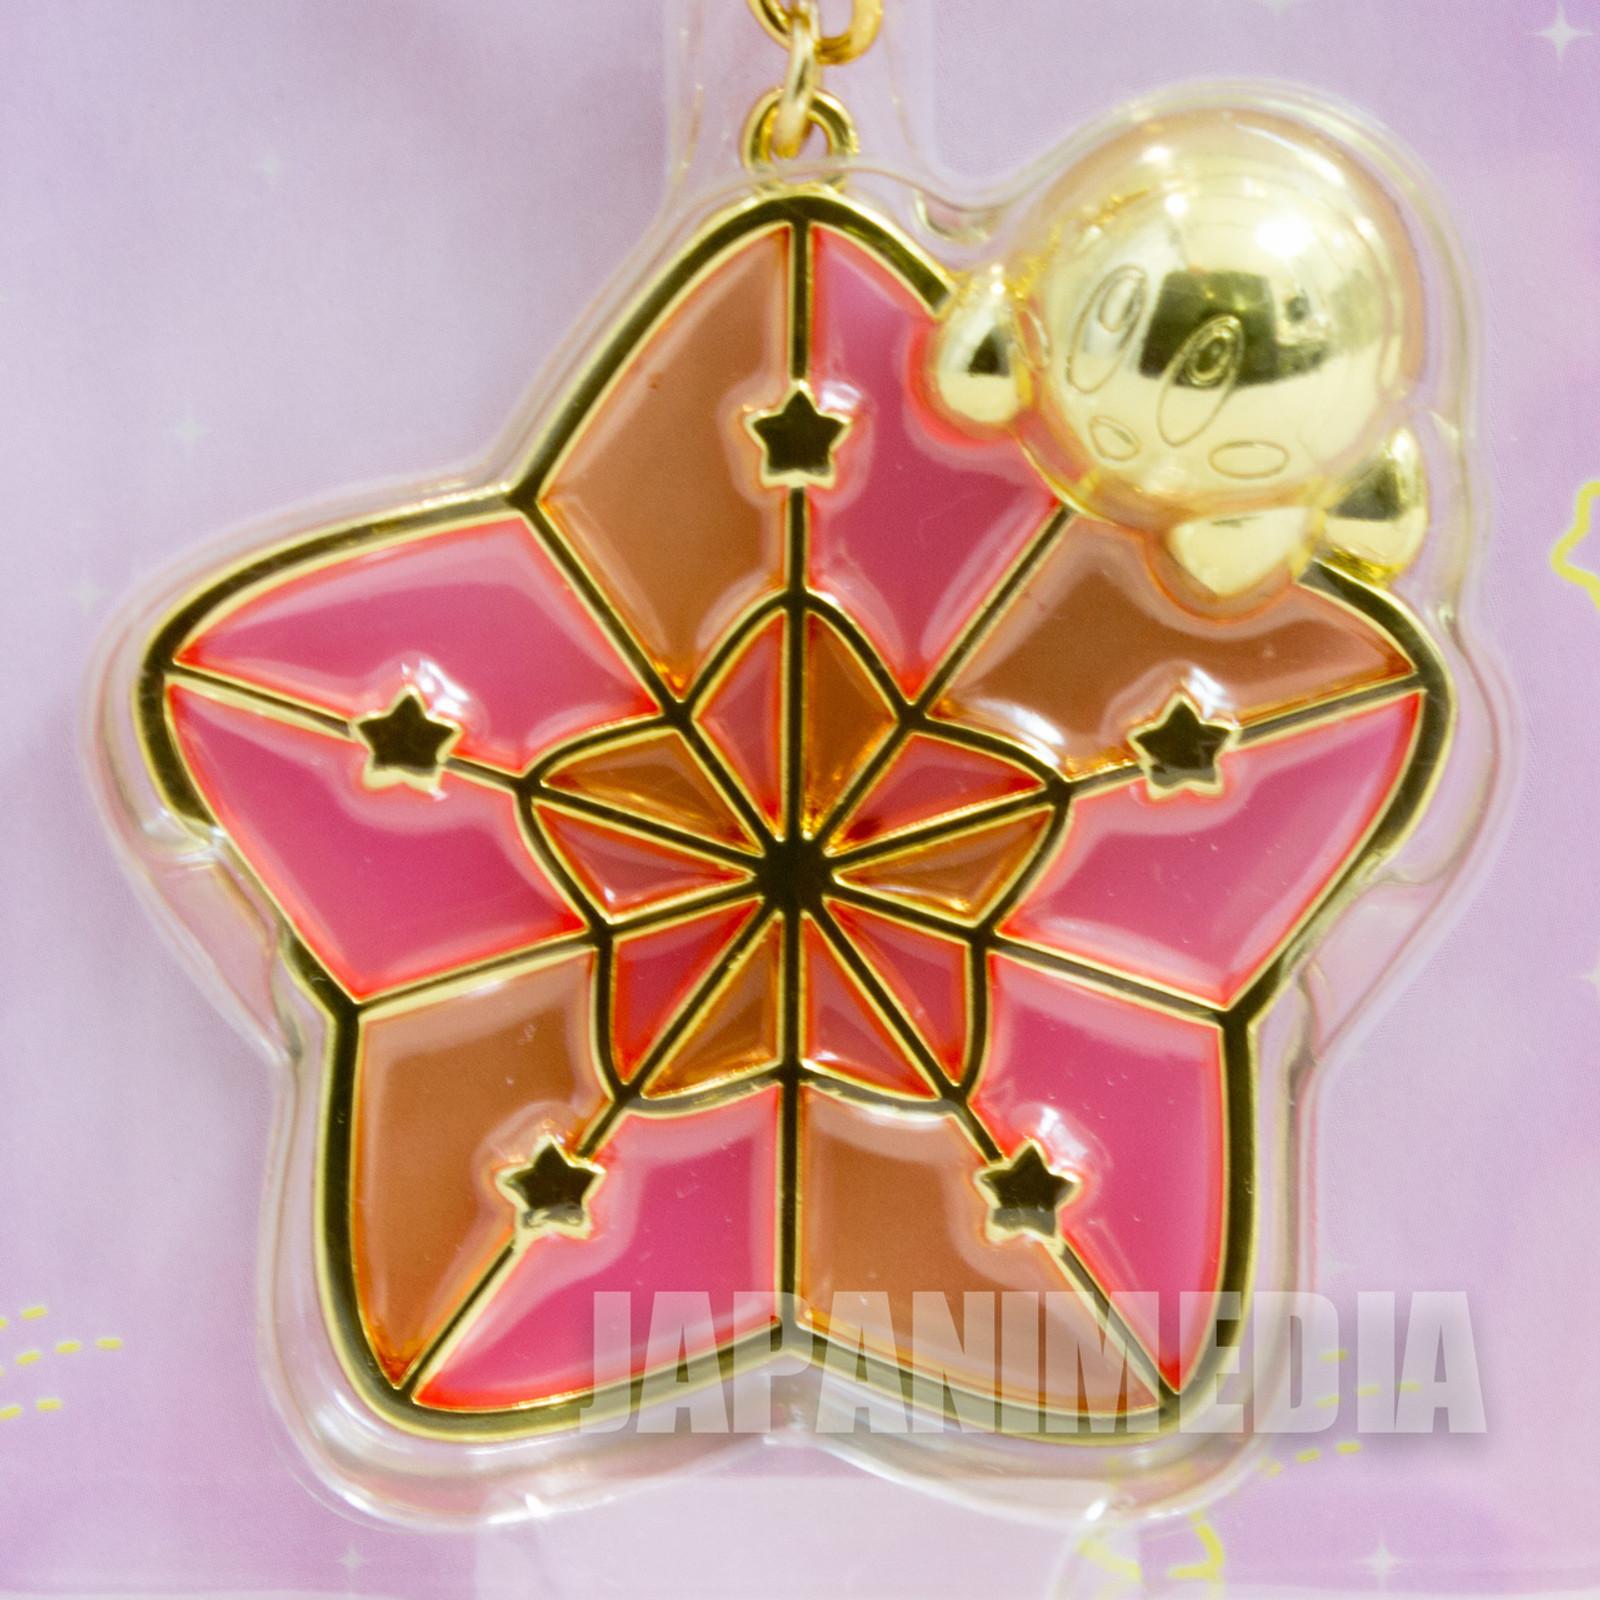 Kirby Super Star Twinkle Night Mascot Charm Keychain Banpresto JAPAN 2